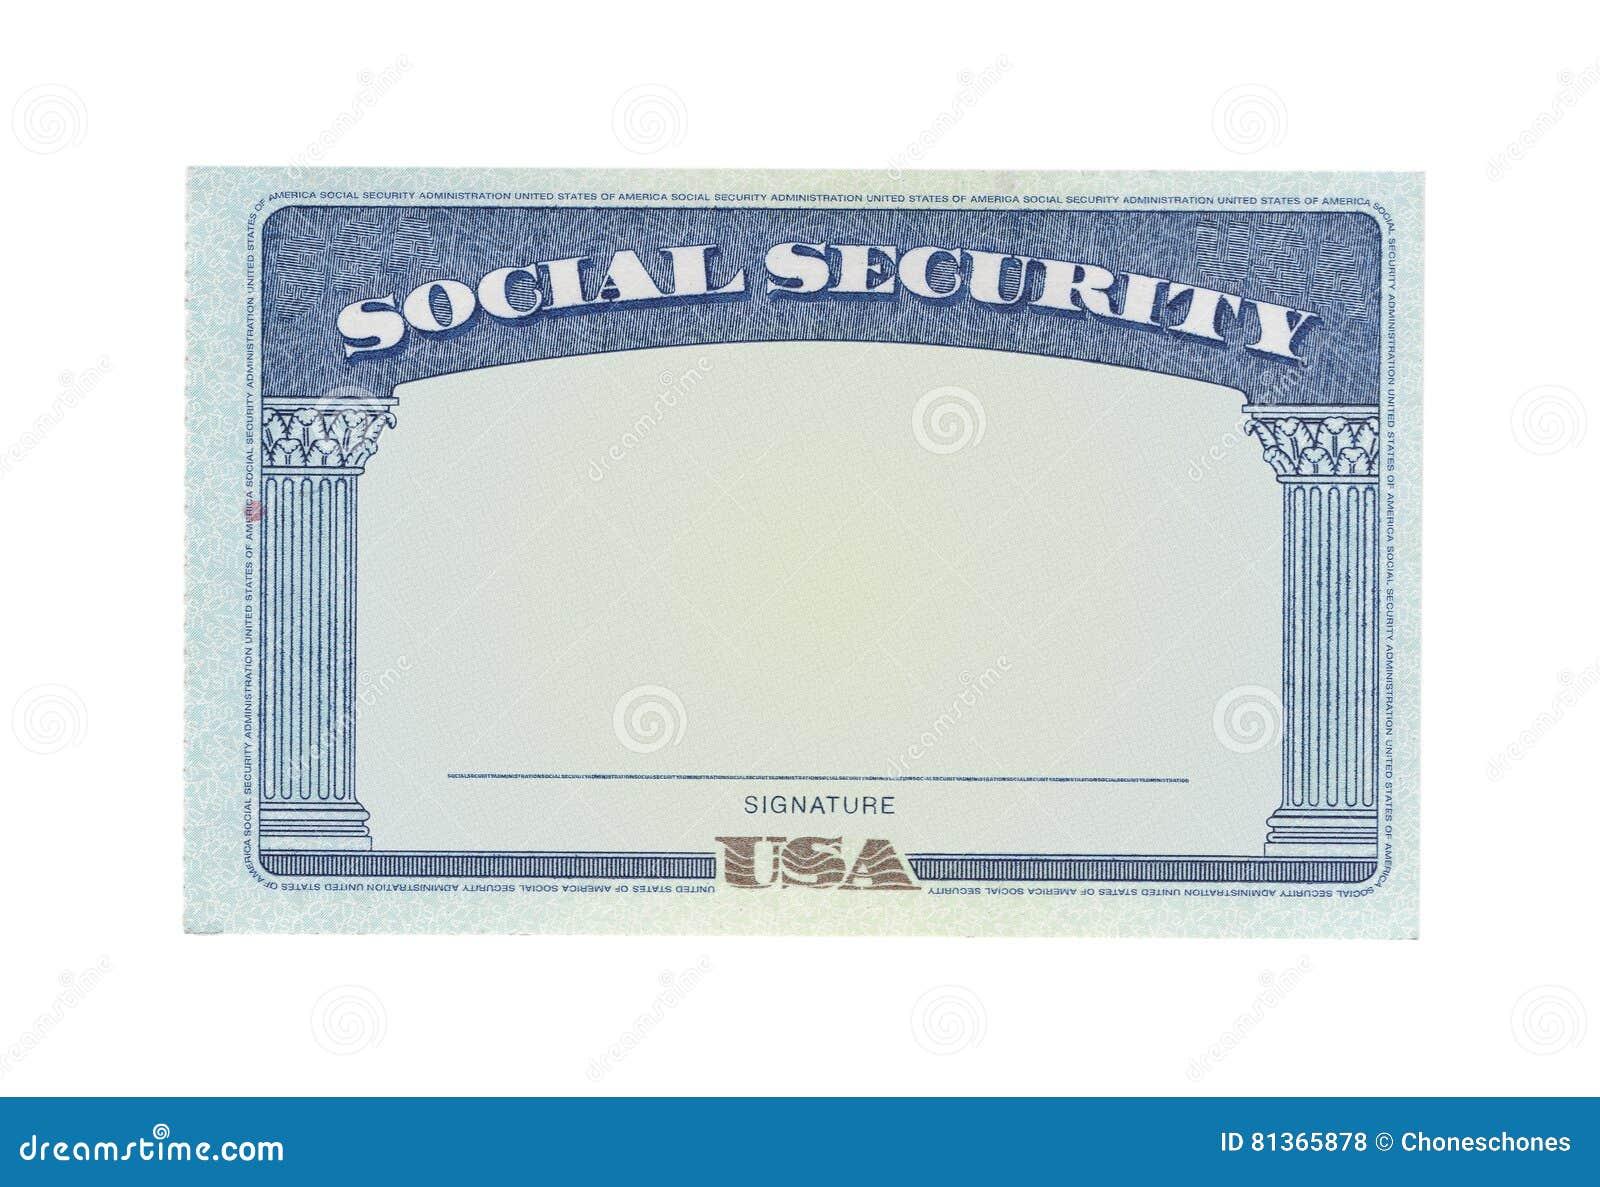 Pustej karty ochrony socjalny